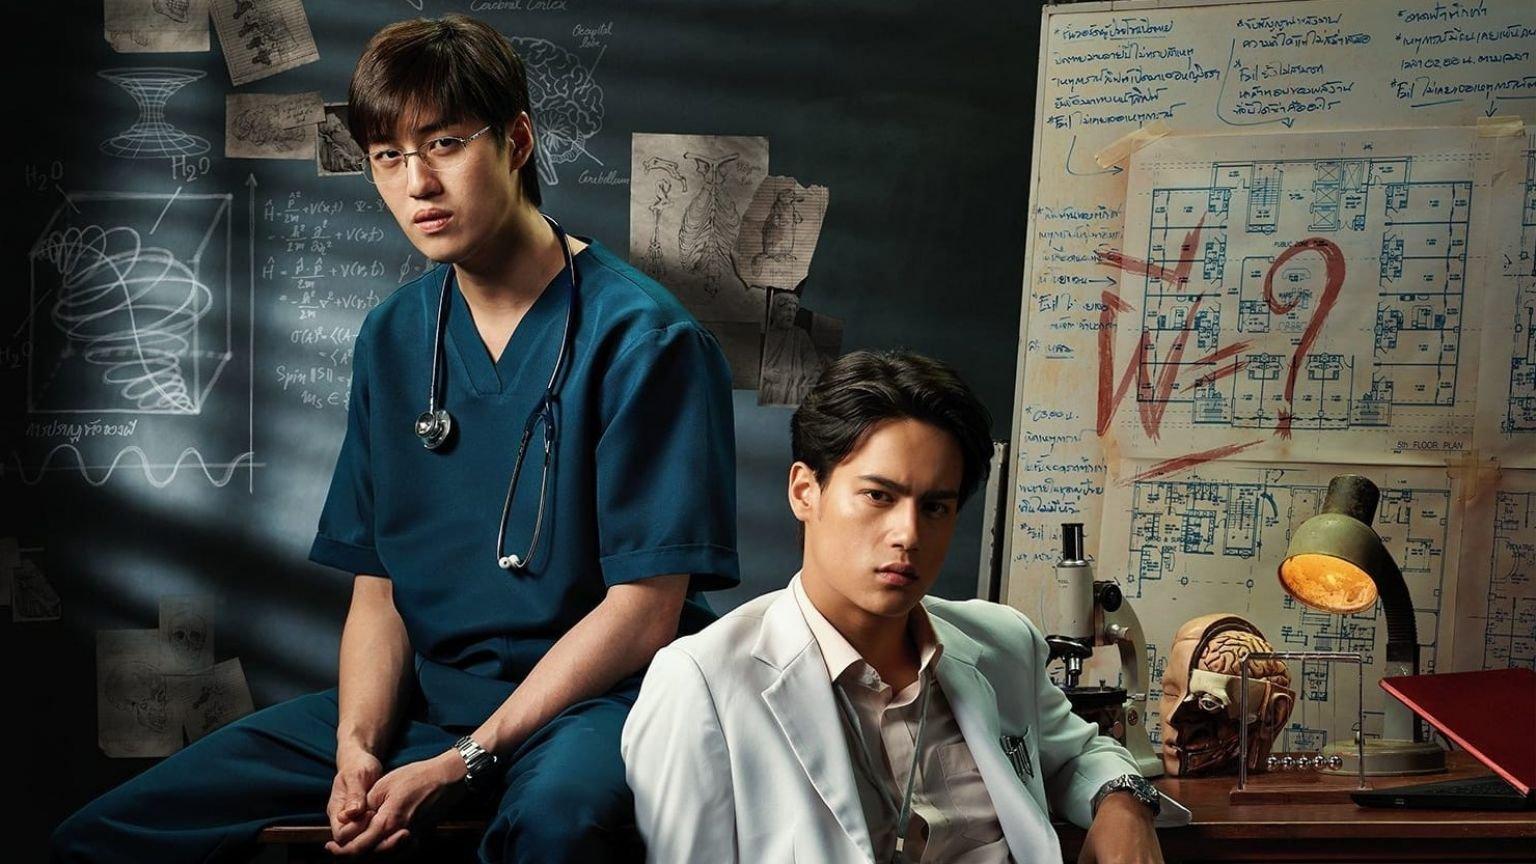 Netflix shares trailer of spooky Thai horror film 'Ghost Lab' - Paudal -  Paudal